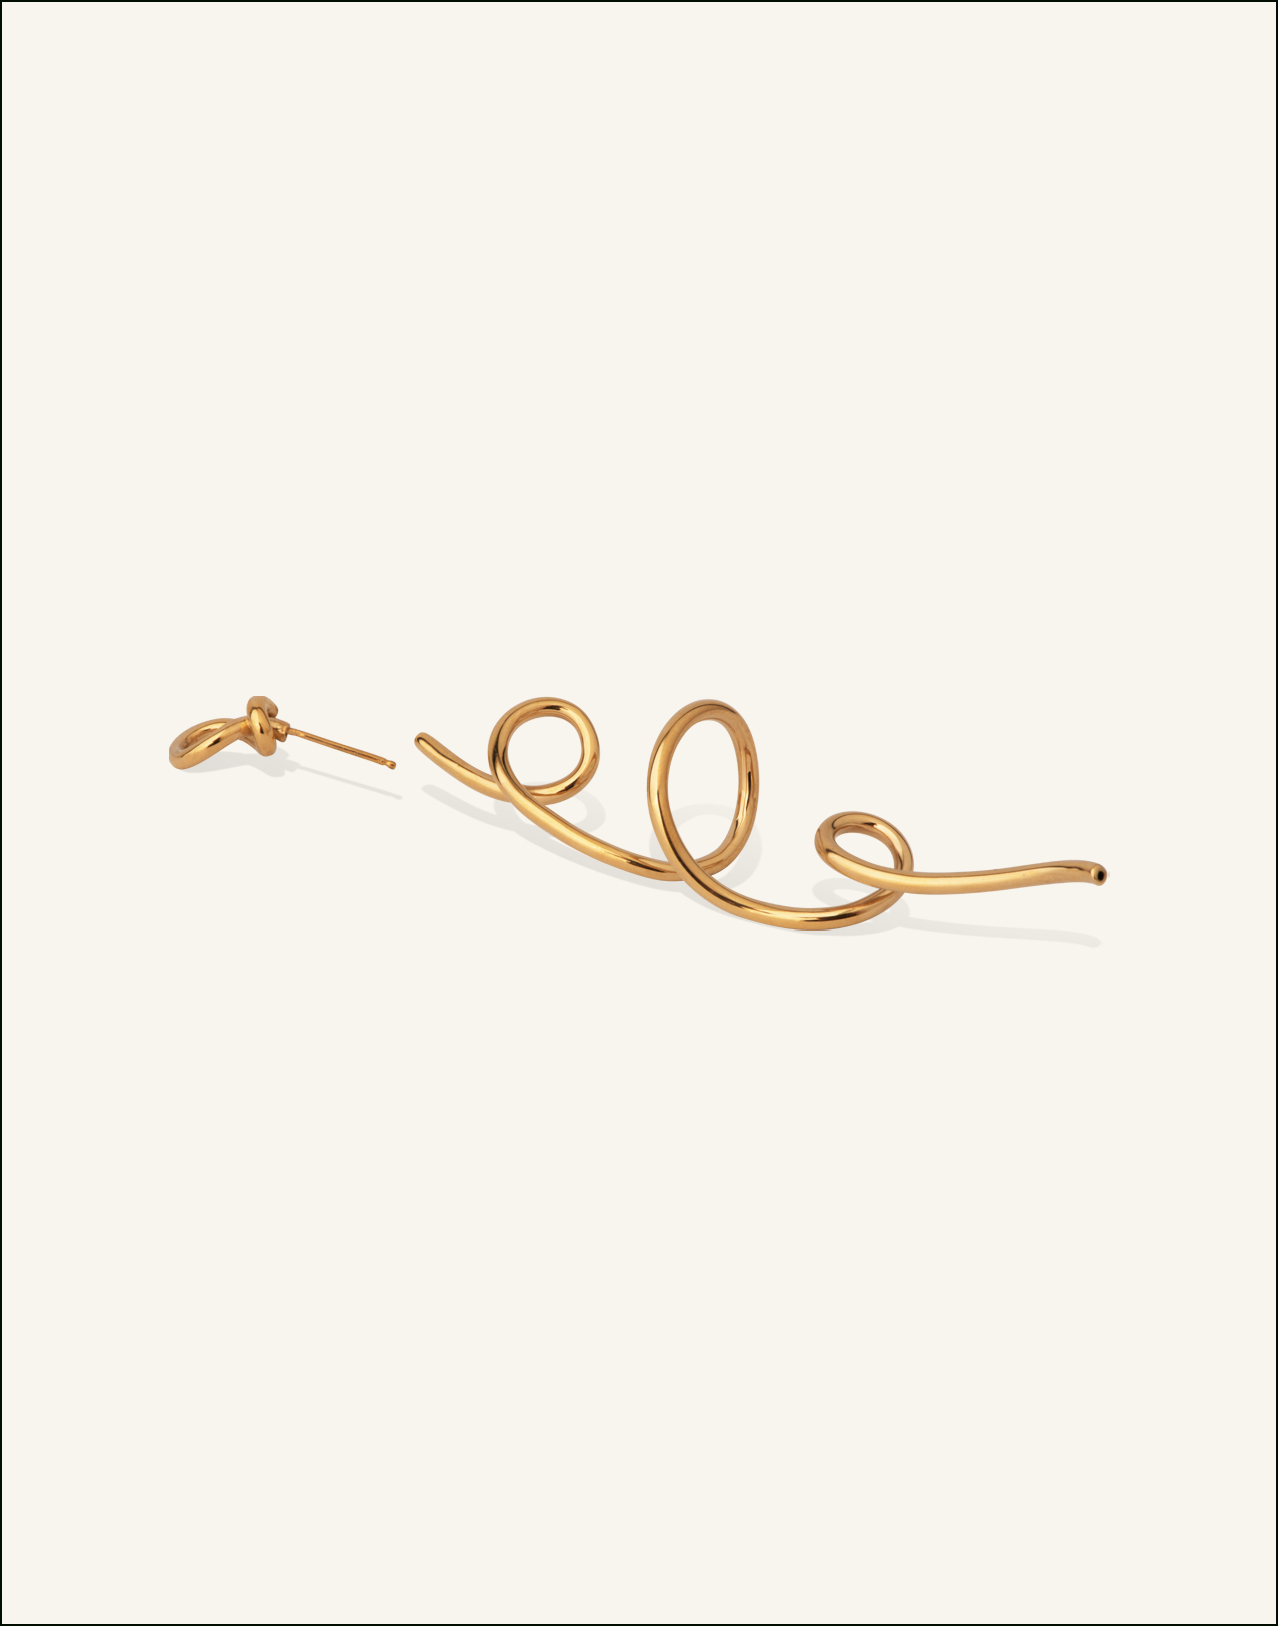 Completedworks-Earrings-Self-Portrait-3-1.jpg